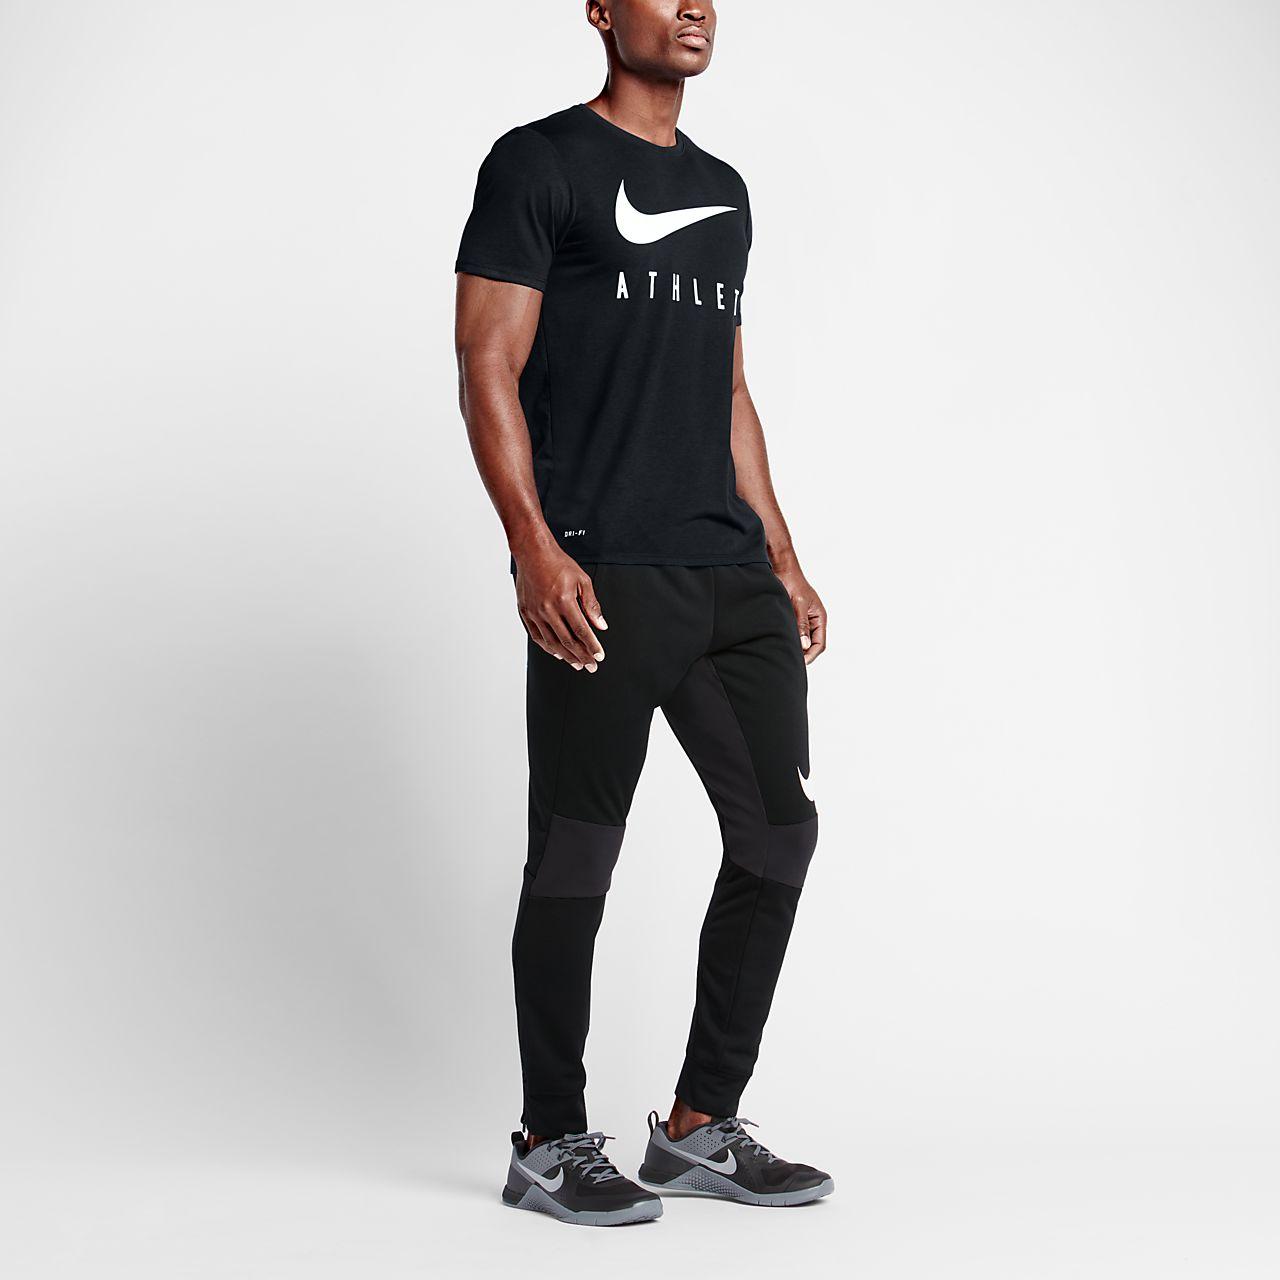 73d3cdaf2 Nike Swoosh Athlete Men's T-Shirt. Nike.com DK